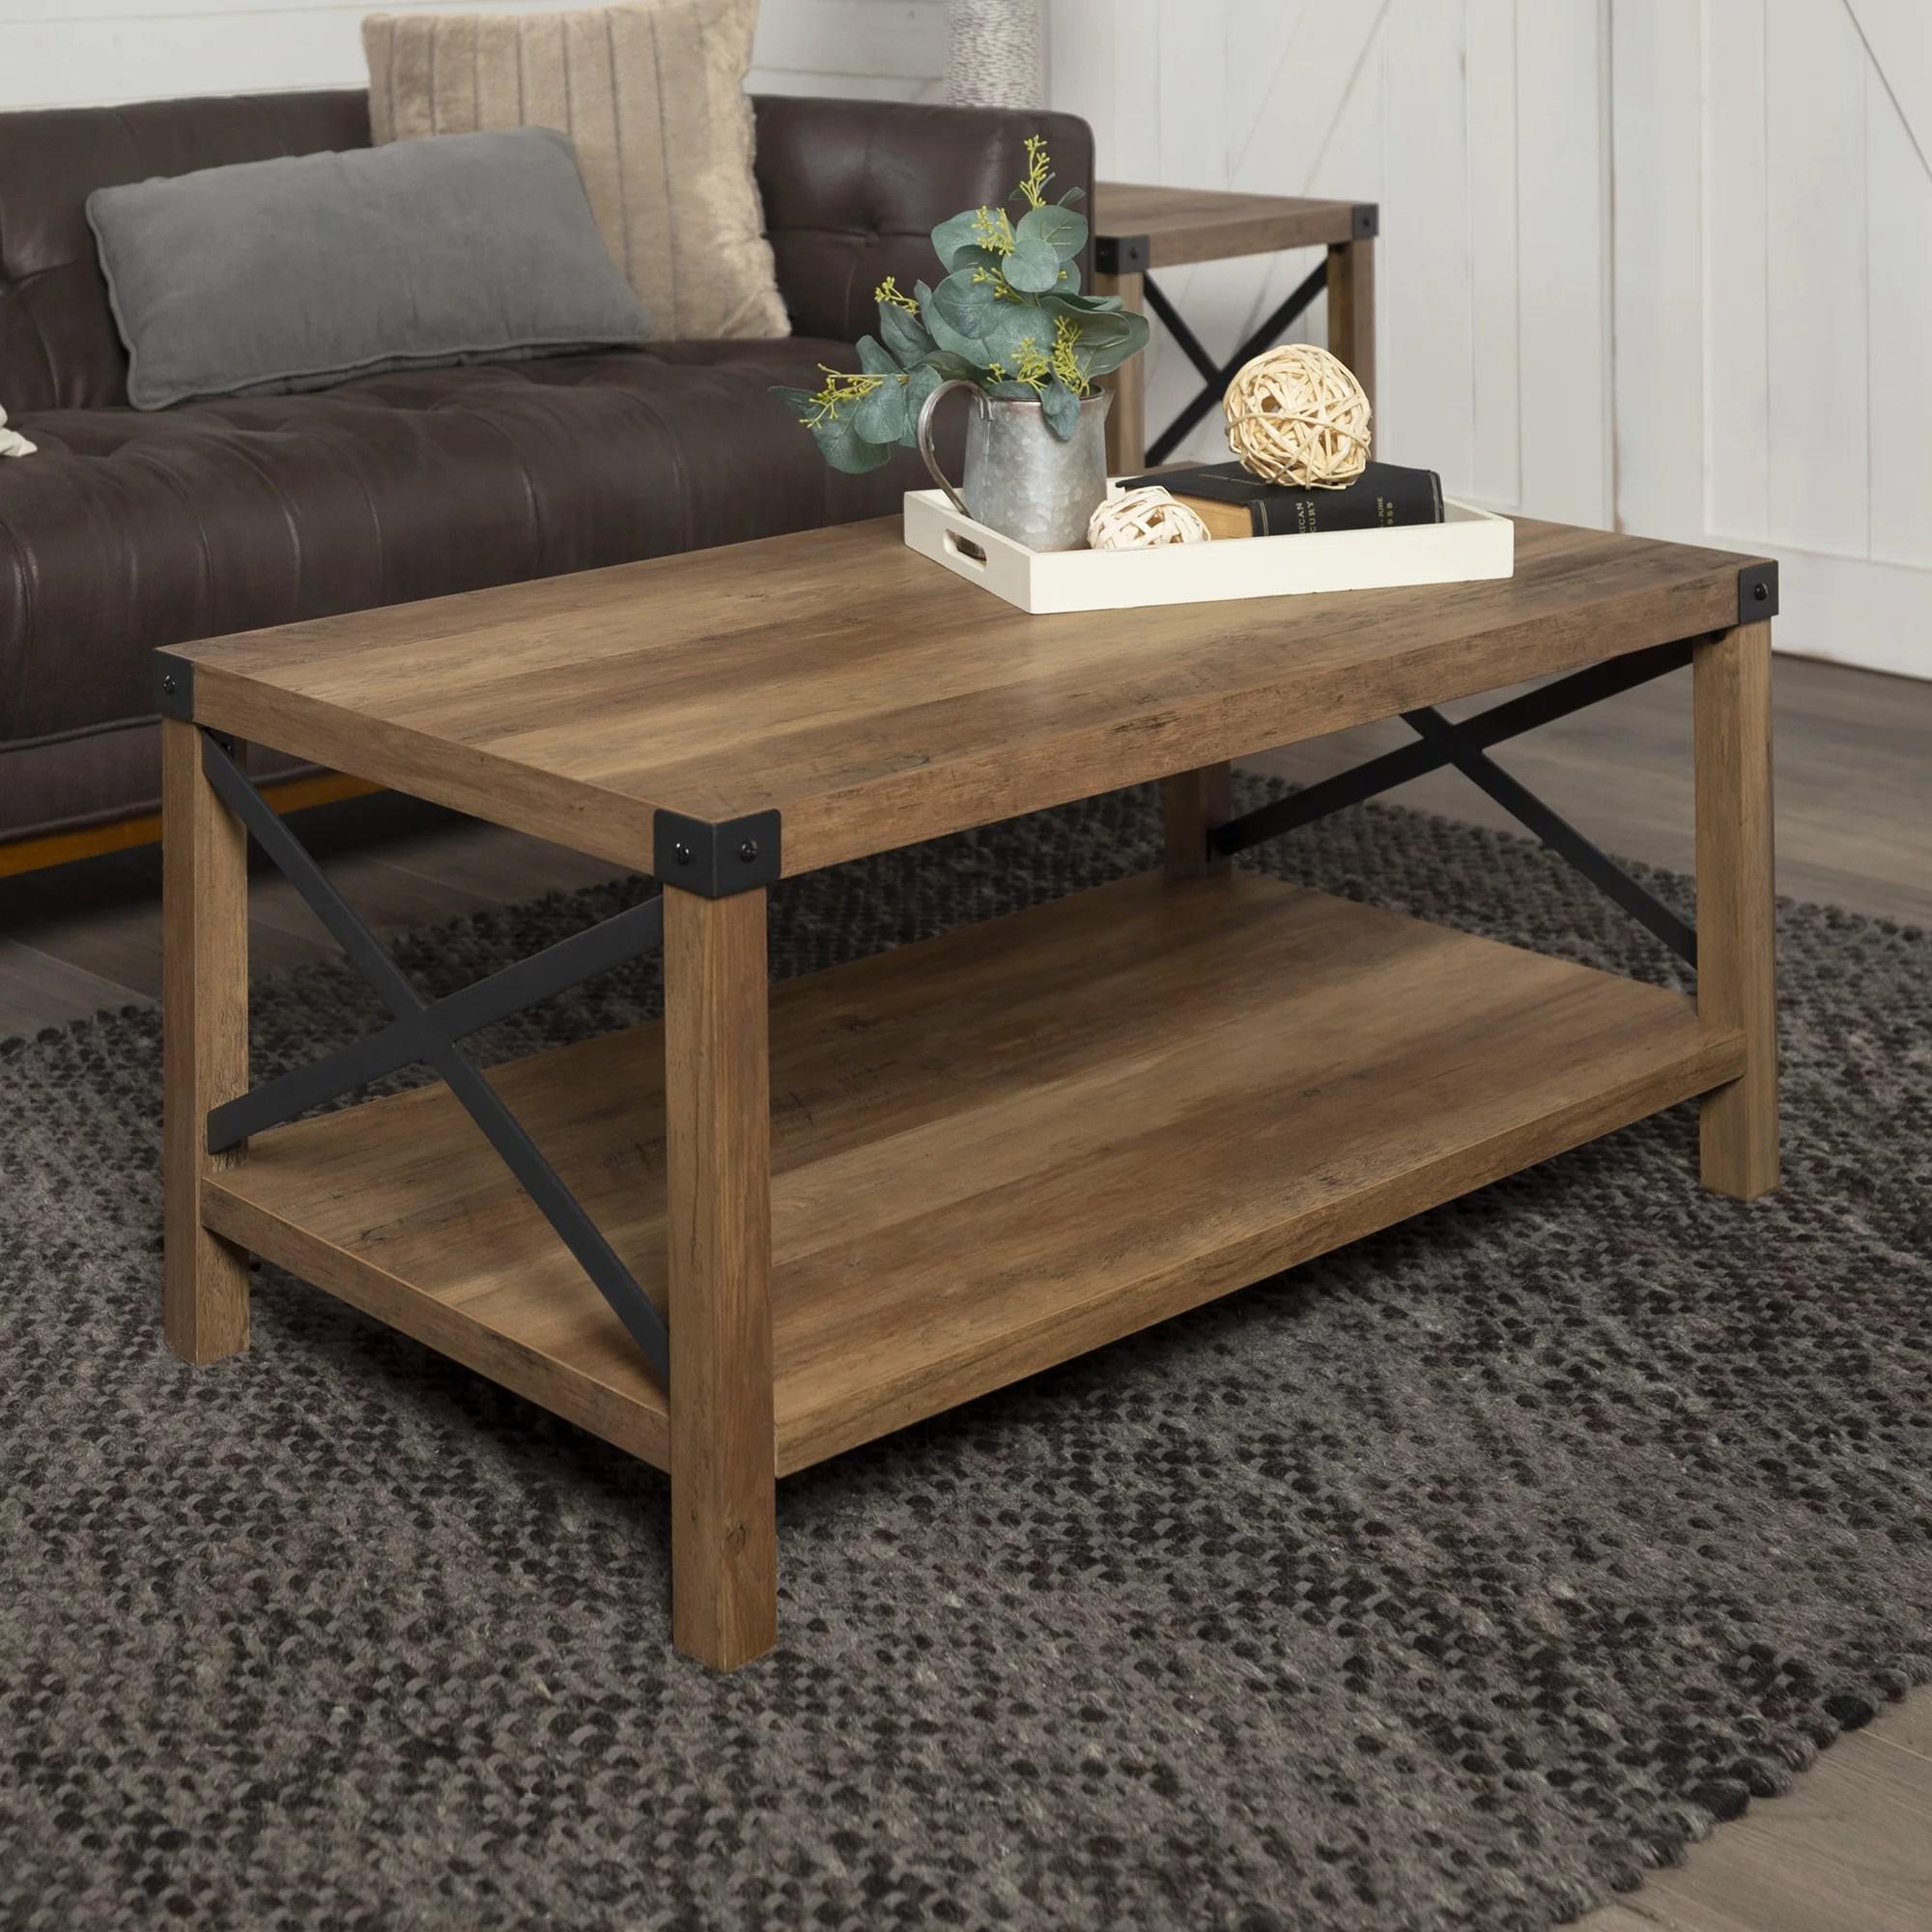 magnolia metal x frame reclaimed barnwood coffee table by desert fields